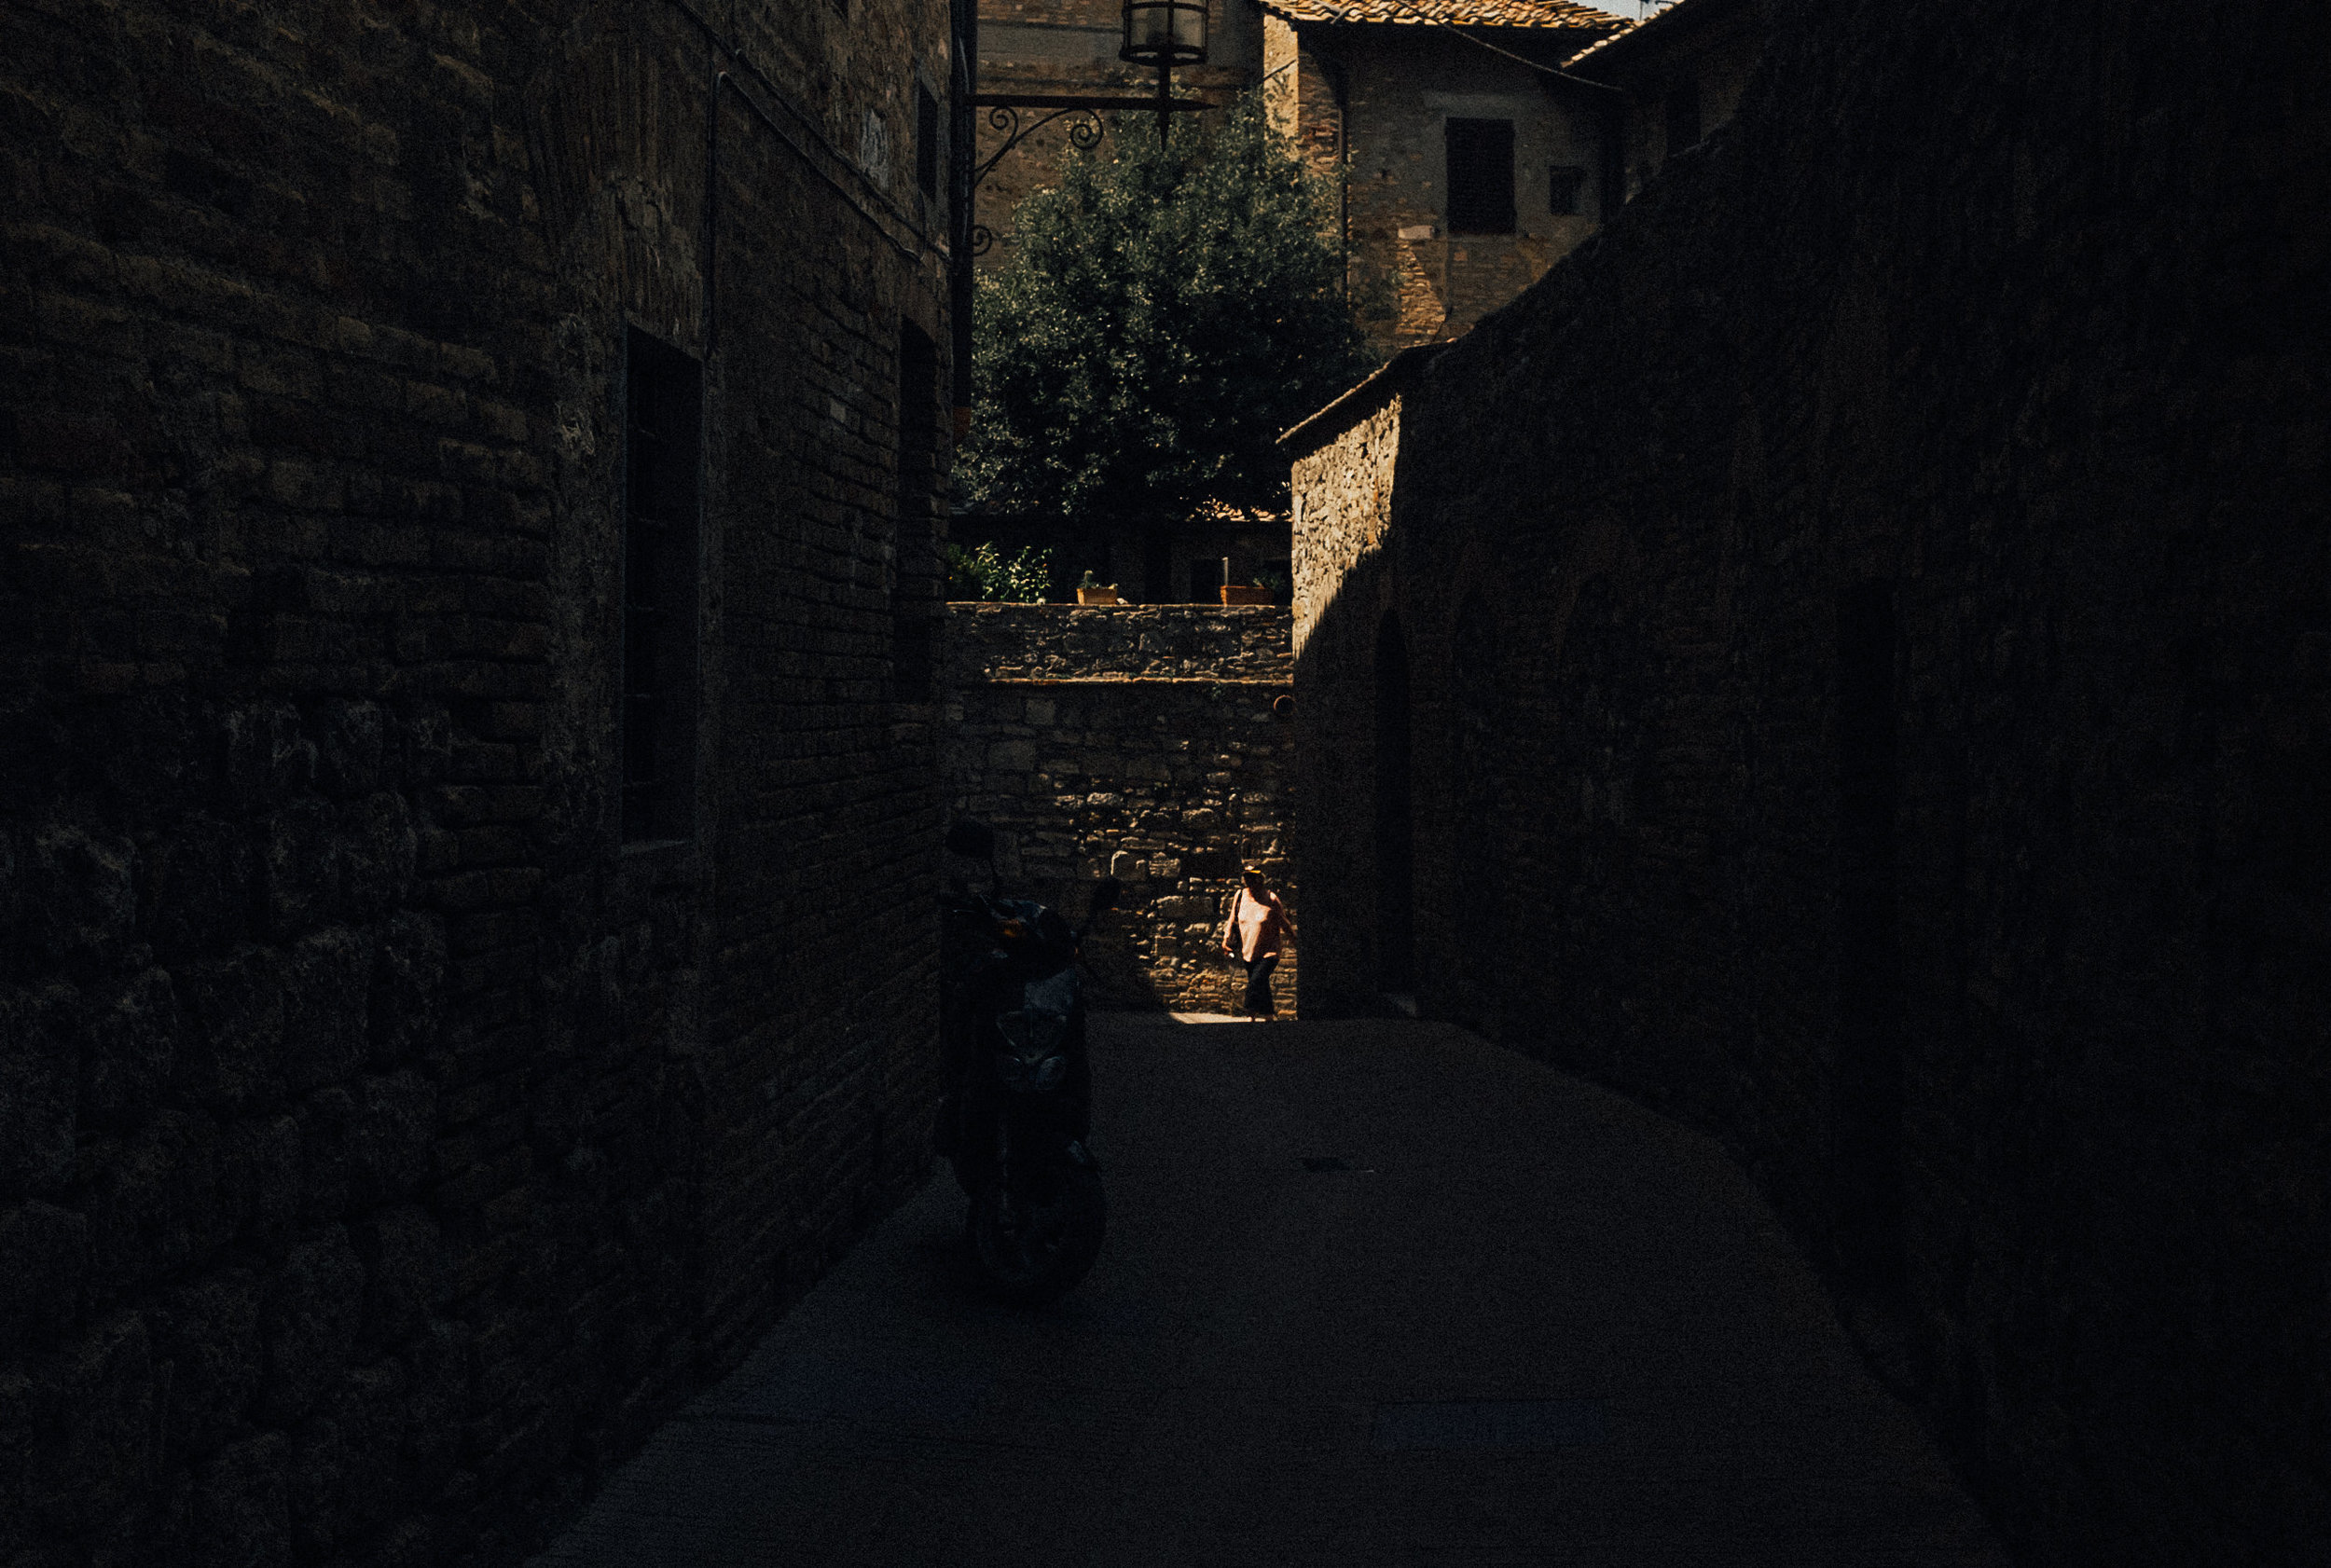 italy_travel_photography249.jpg